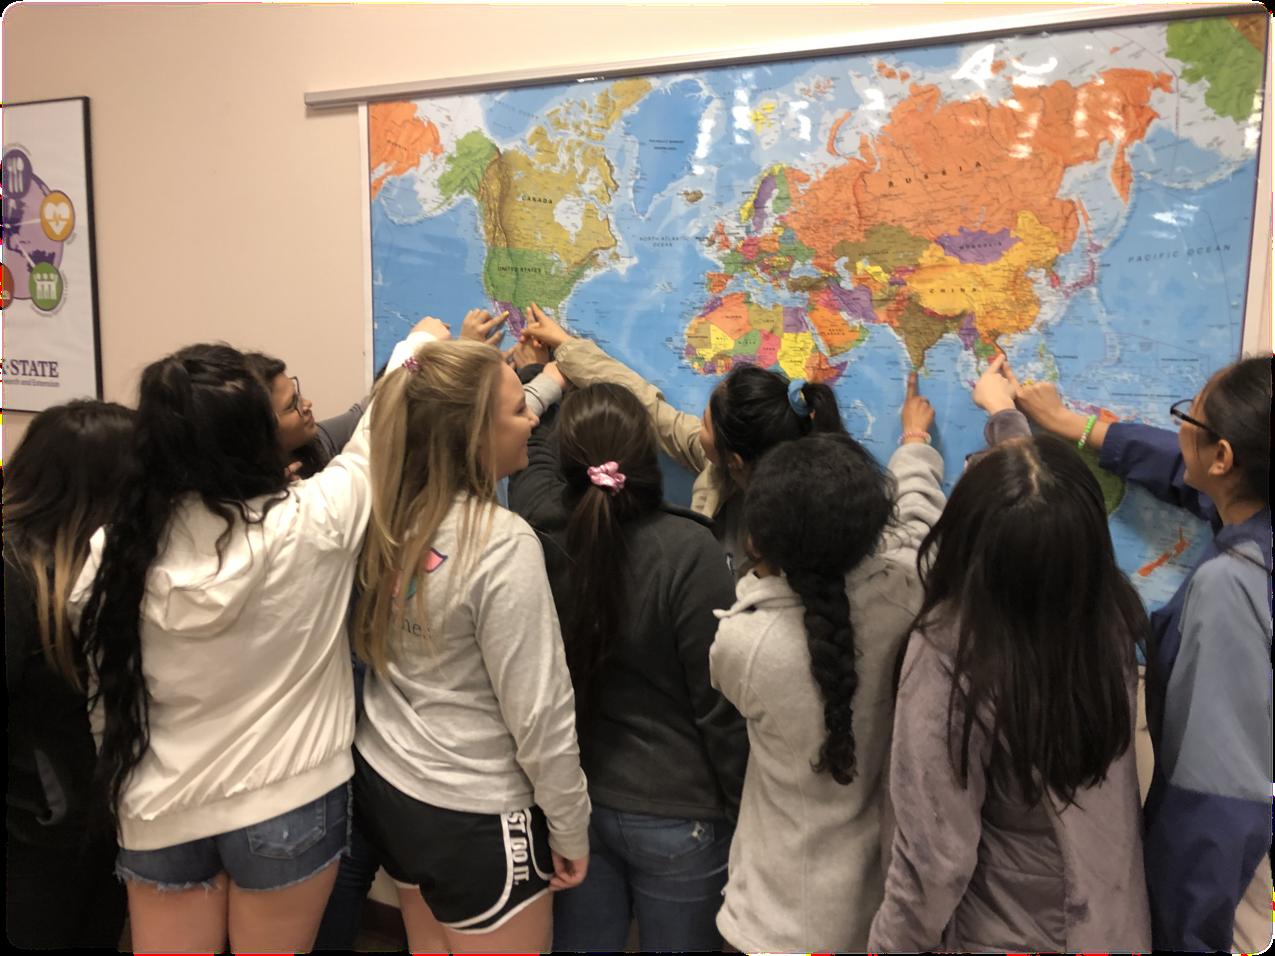 Girls pointing at map.jpg